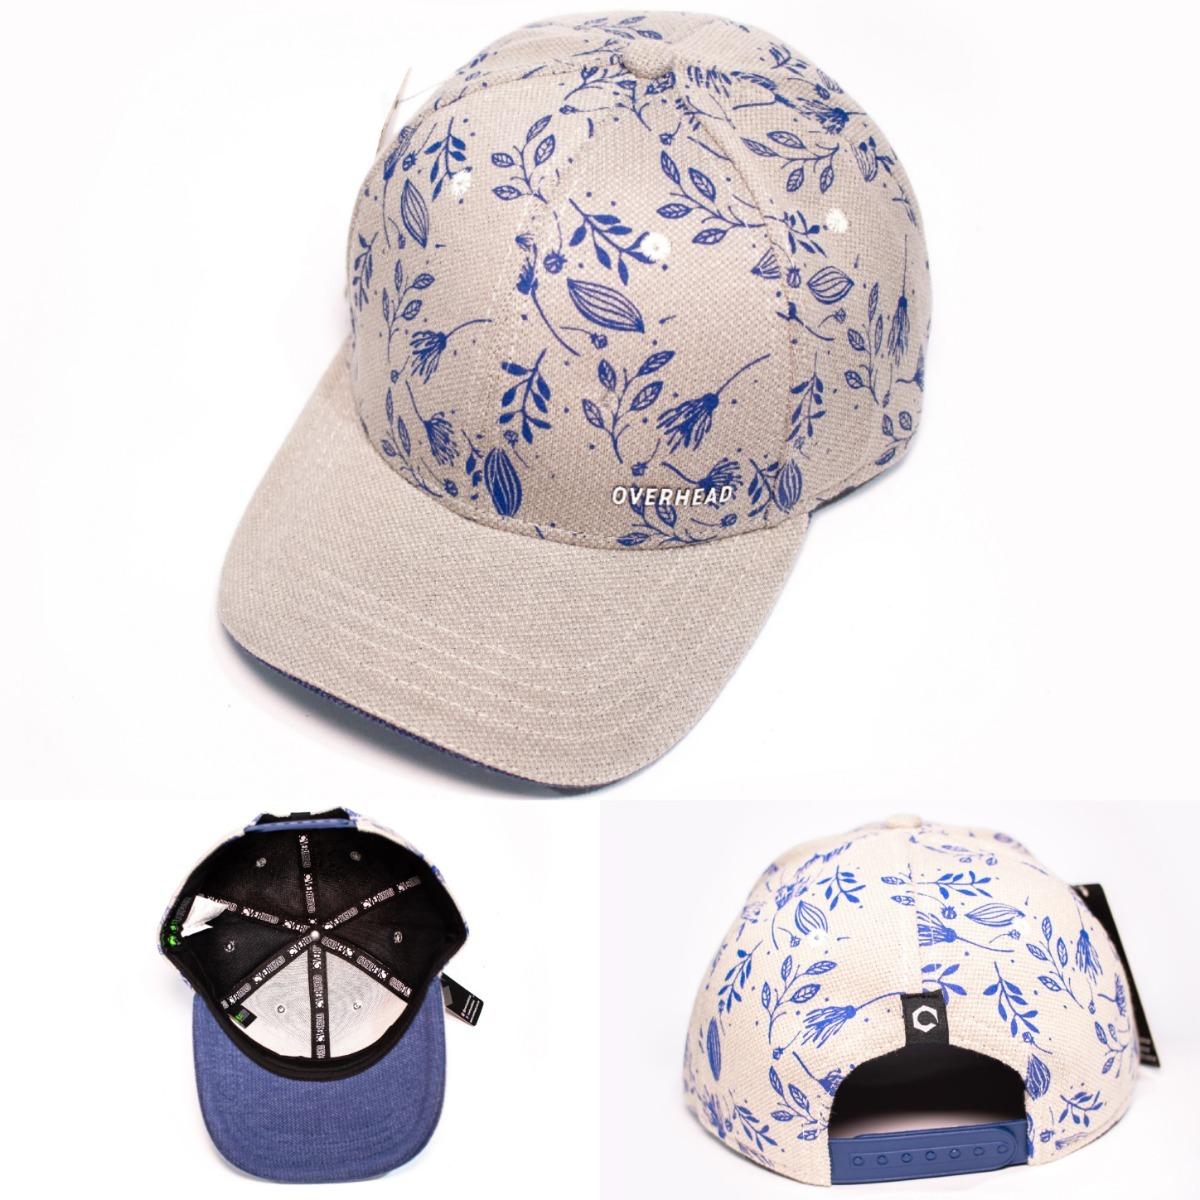 97cbc7584c boné chapeu aba curva estampado floral fores folha azul. Carregando zoom.